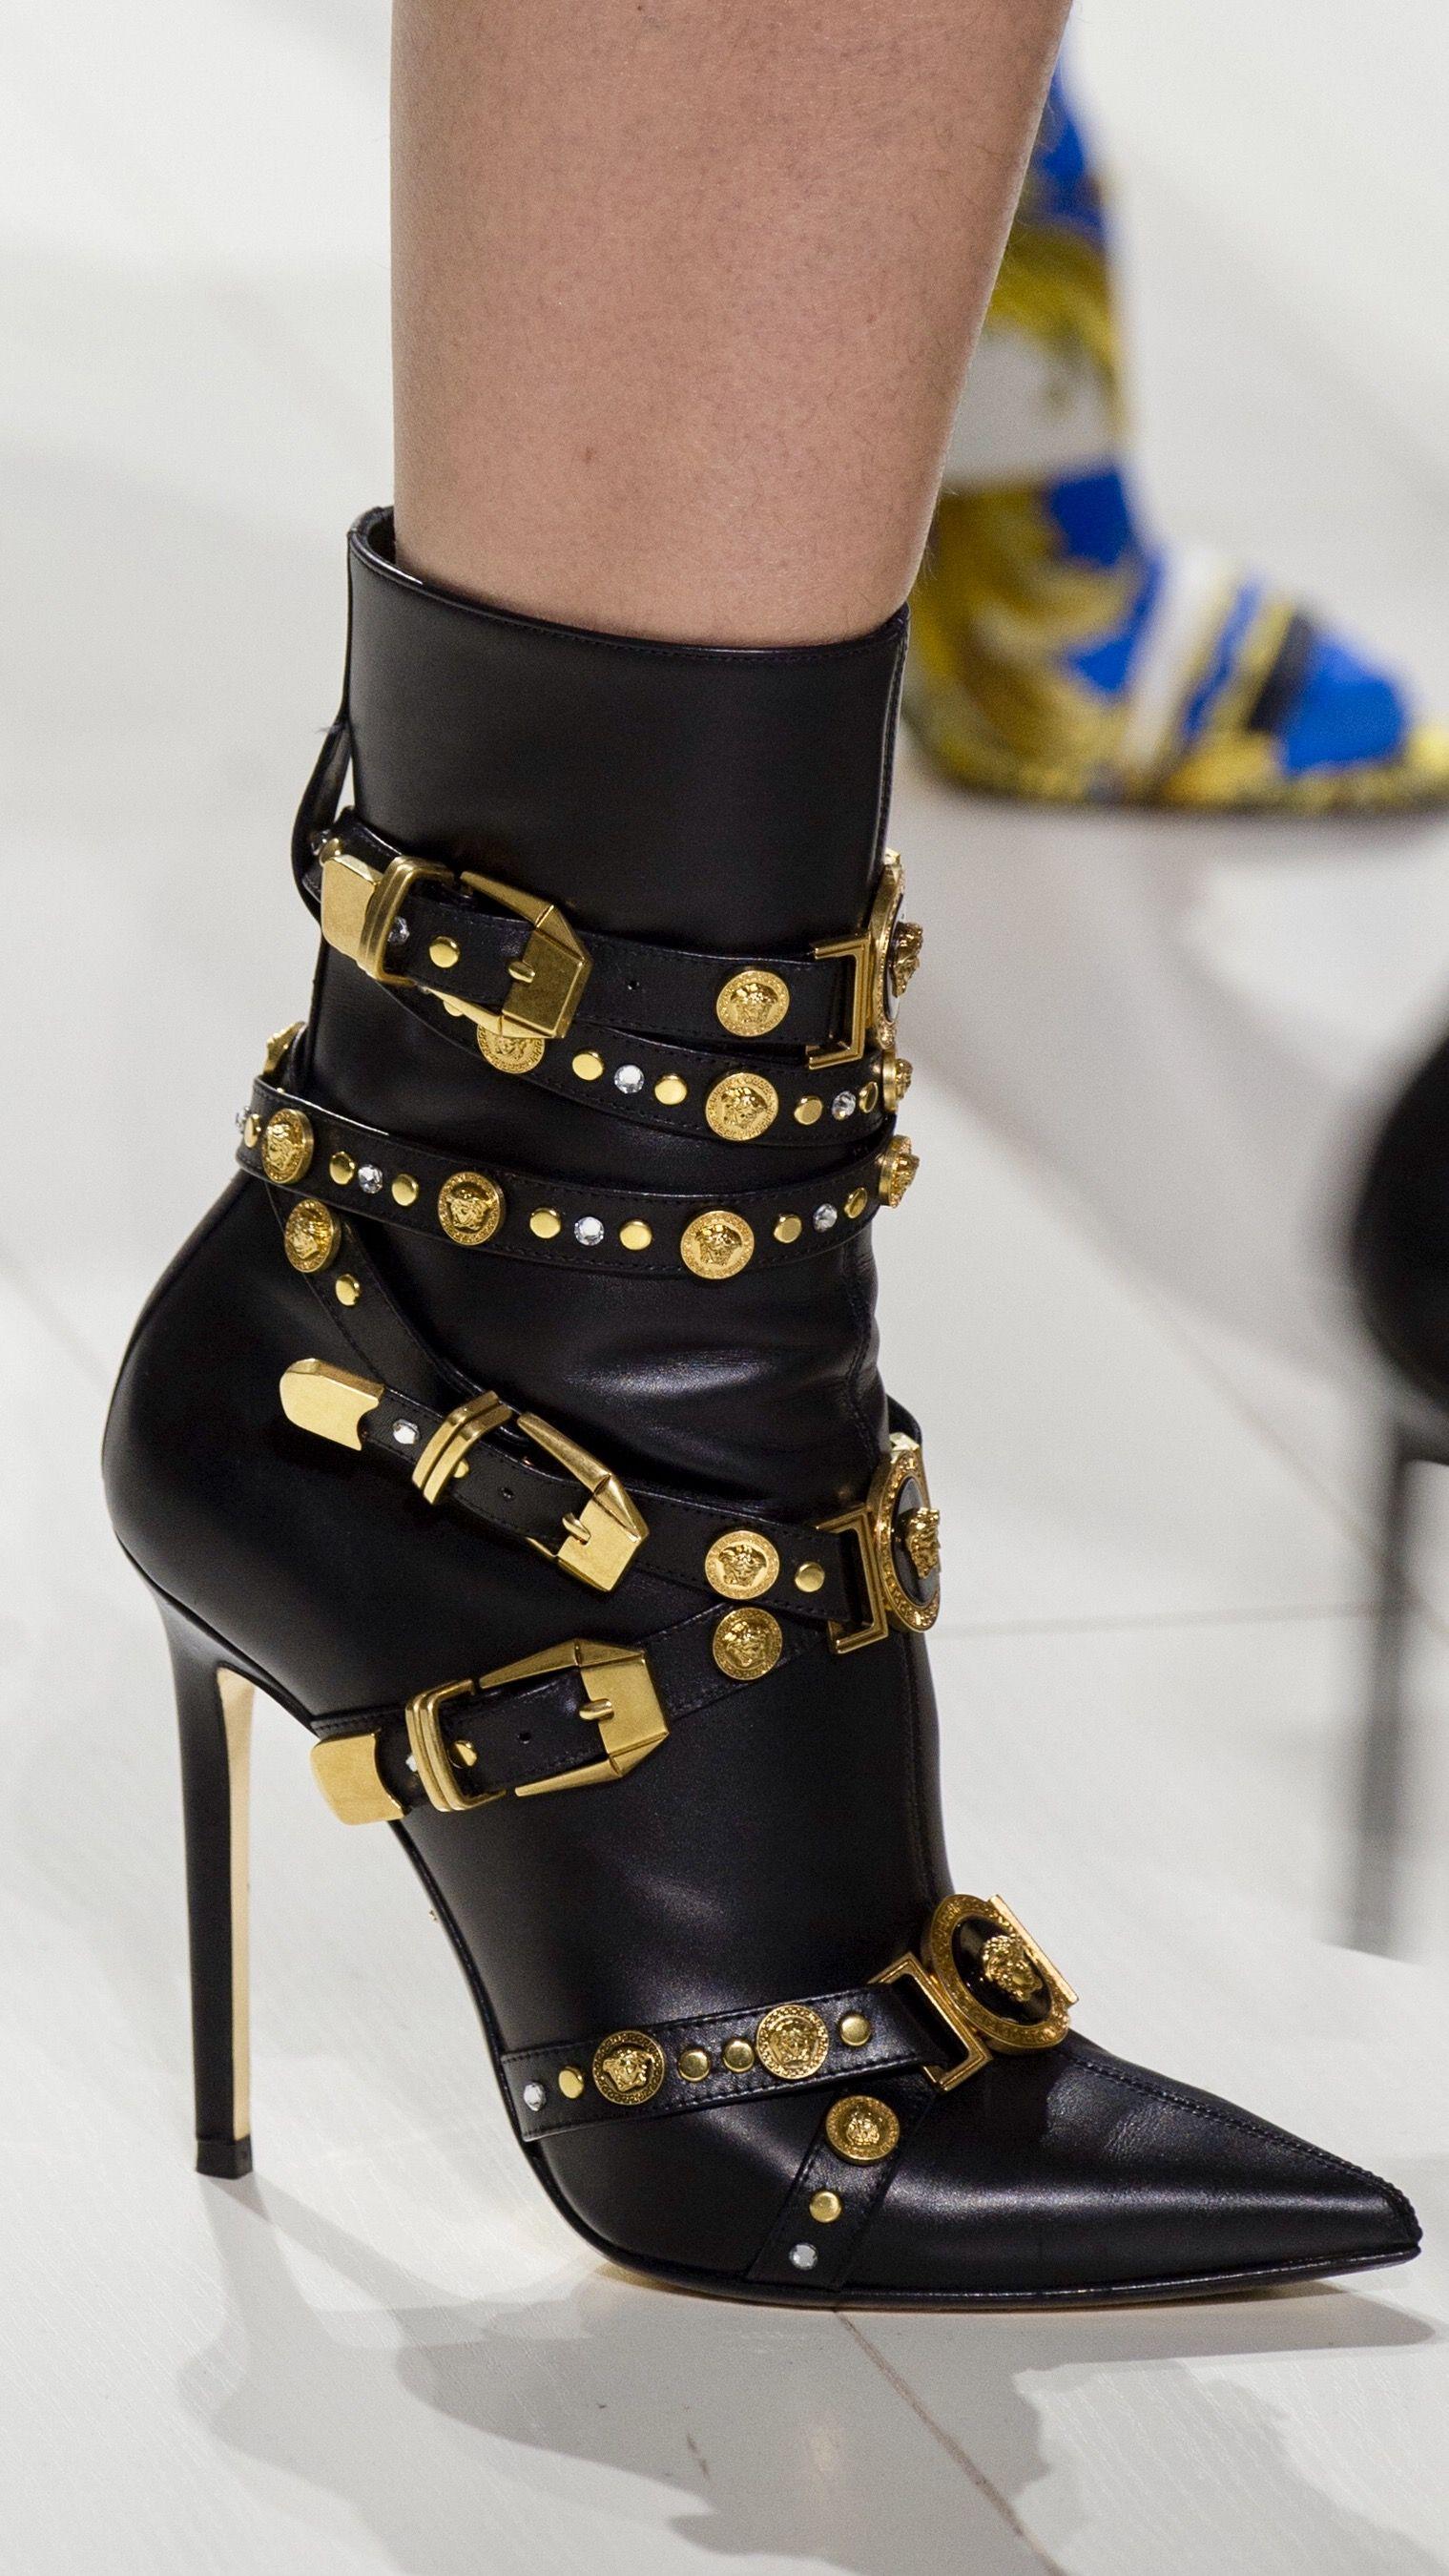 Boots, Fashion boots, Fashion shoes